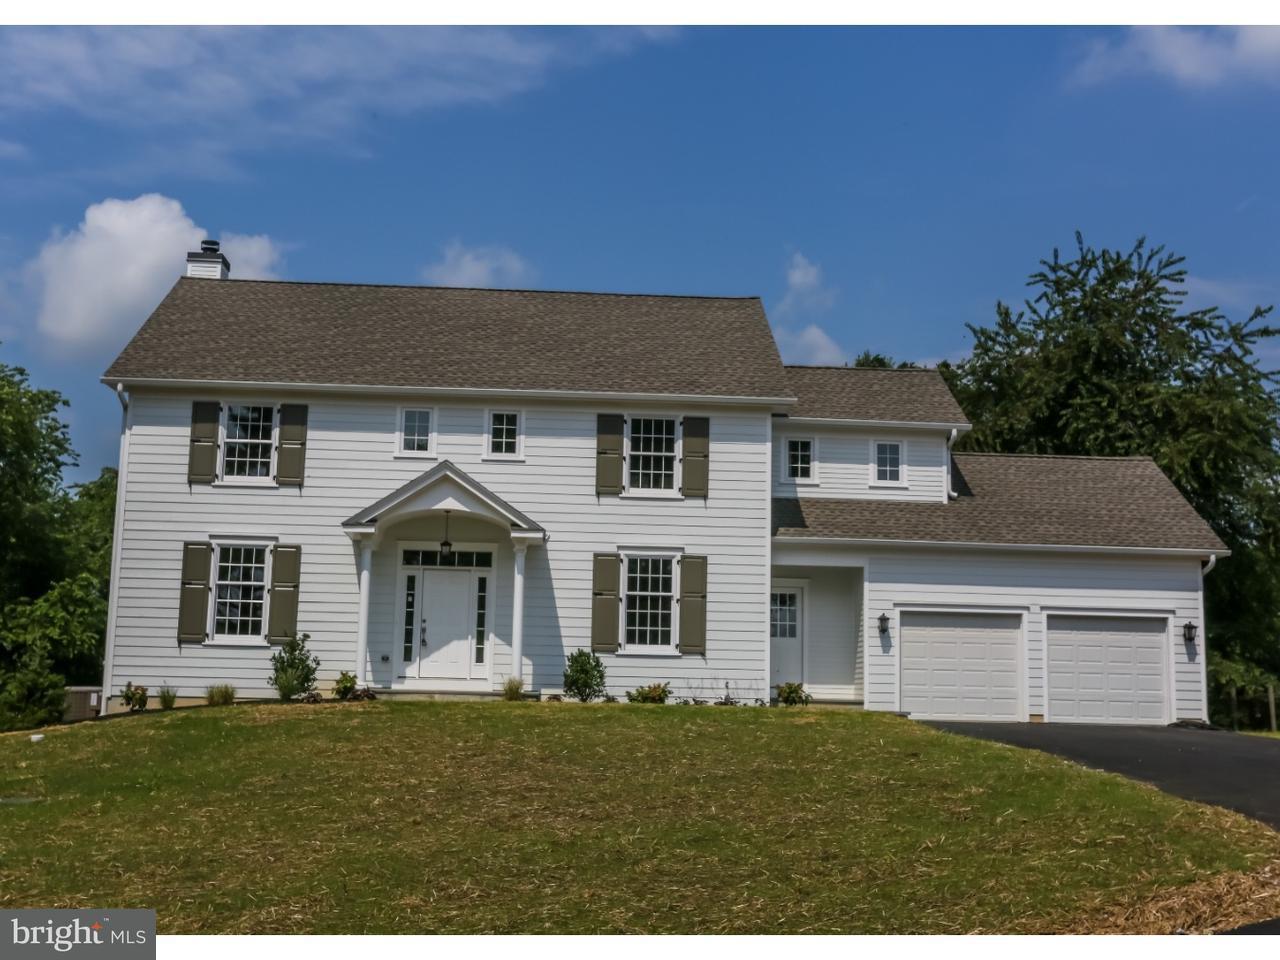 Single Family Home for Sale at 101 POPLAR TREE Road Unionville, Pennsylvania 19348 United States